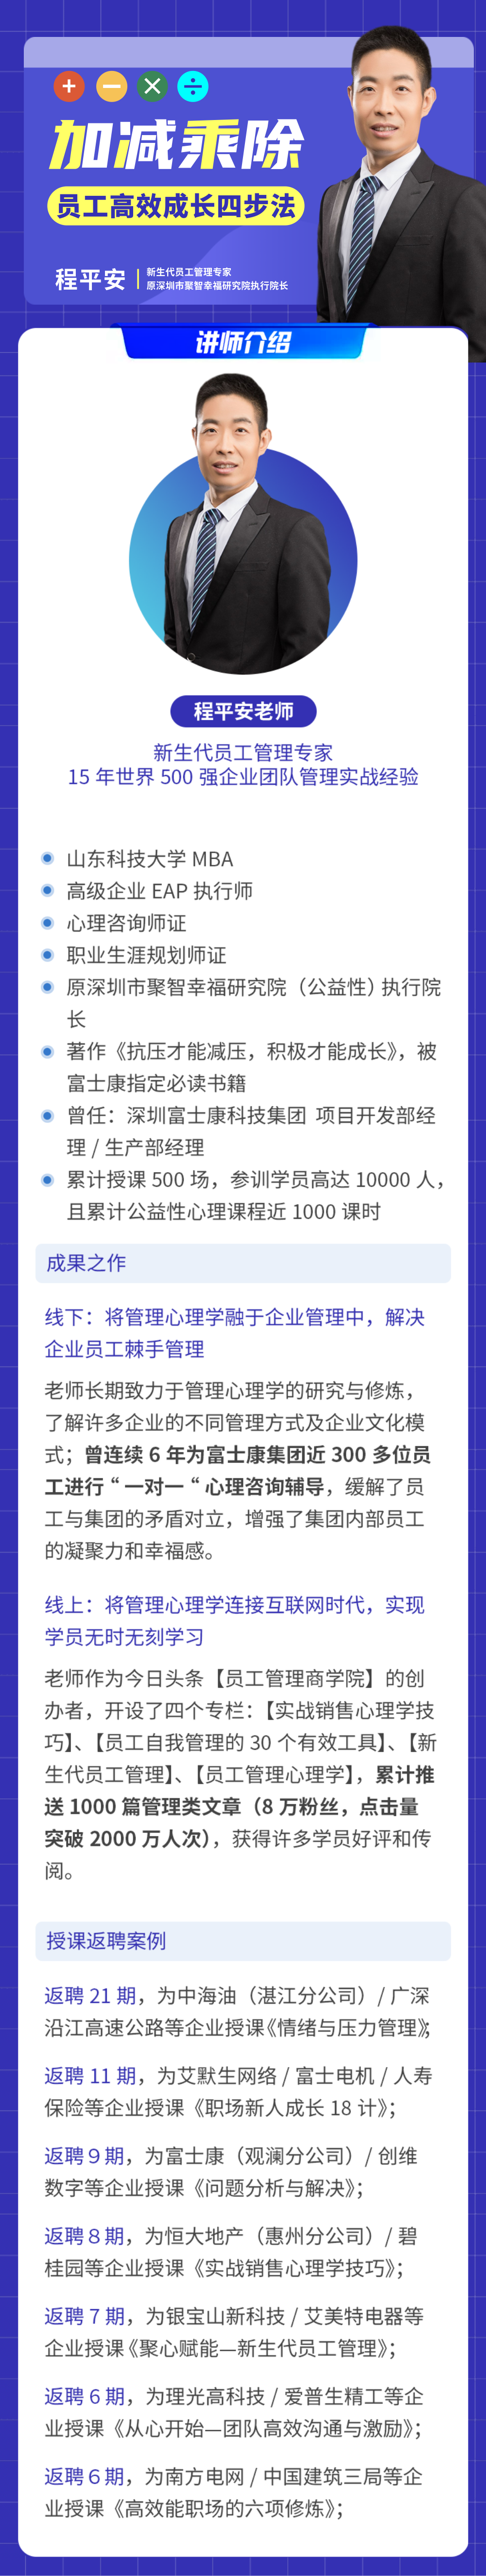 3e9684307a50c27ea048b7cbc2bc0dc1 - 加减乘除员工高效成长四步法(精品短课)